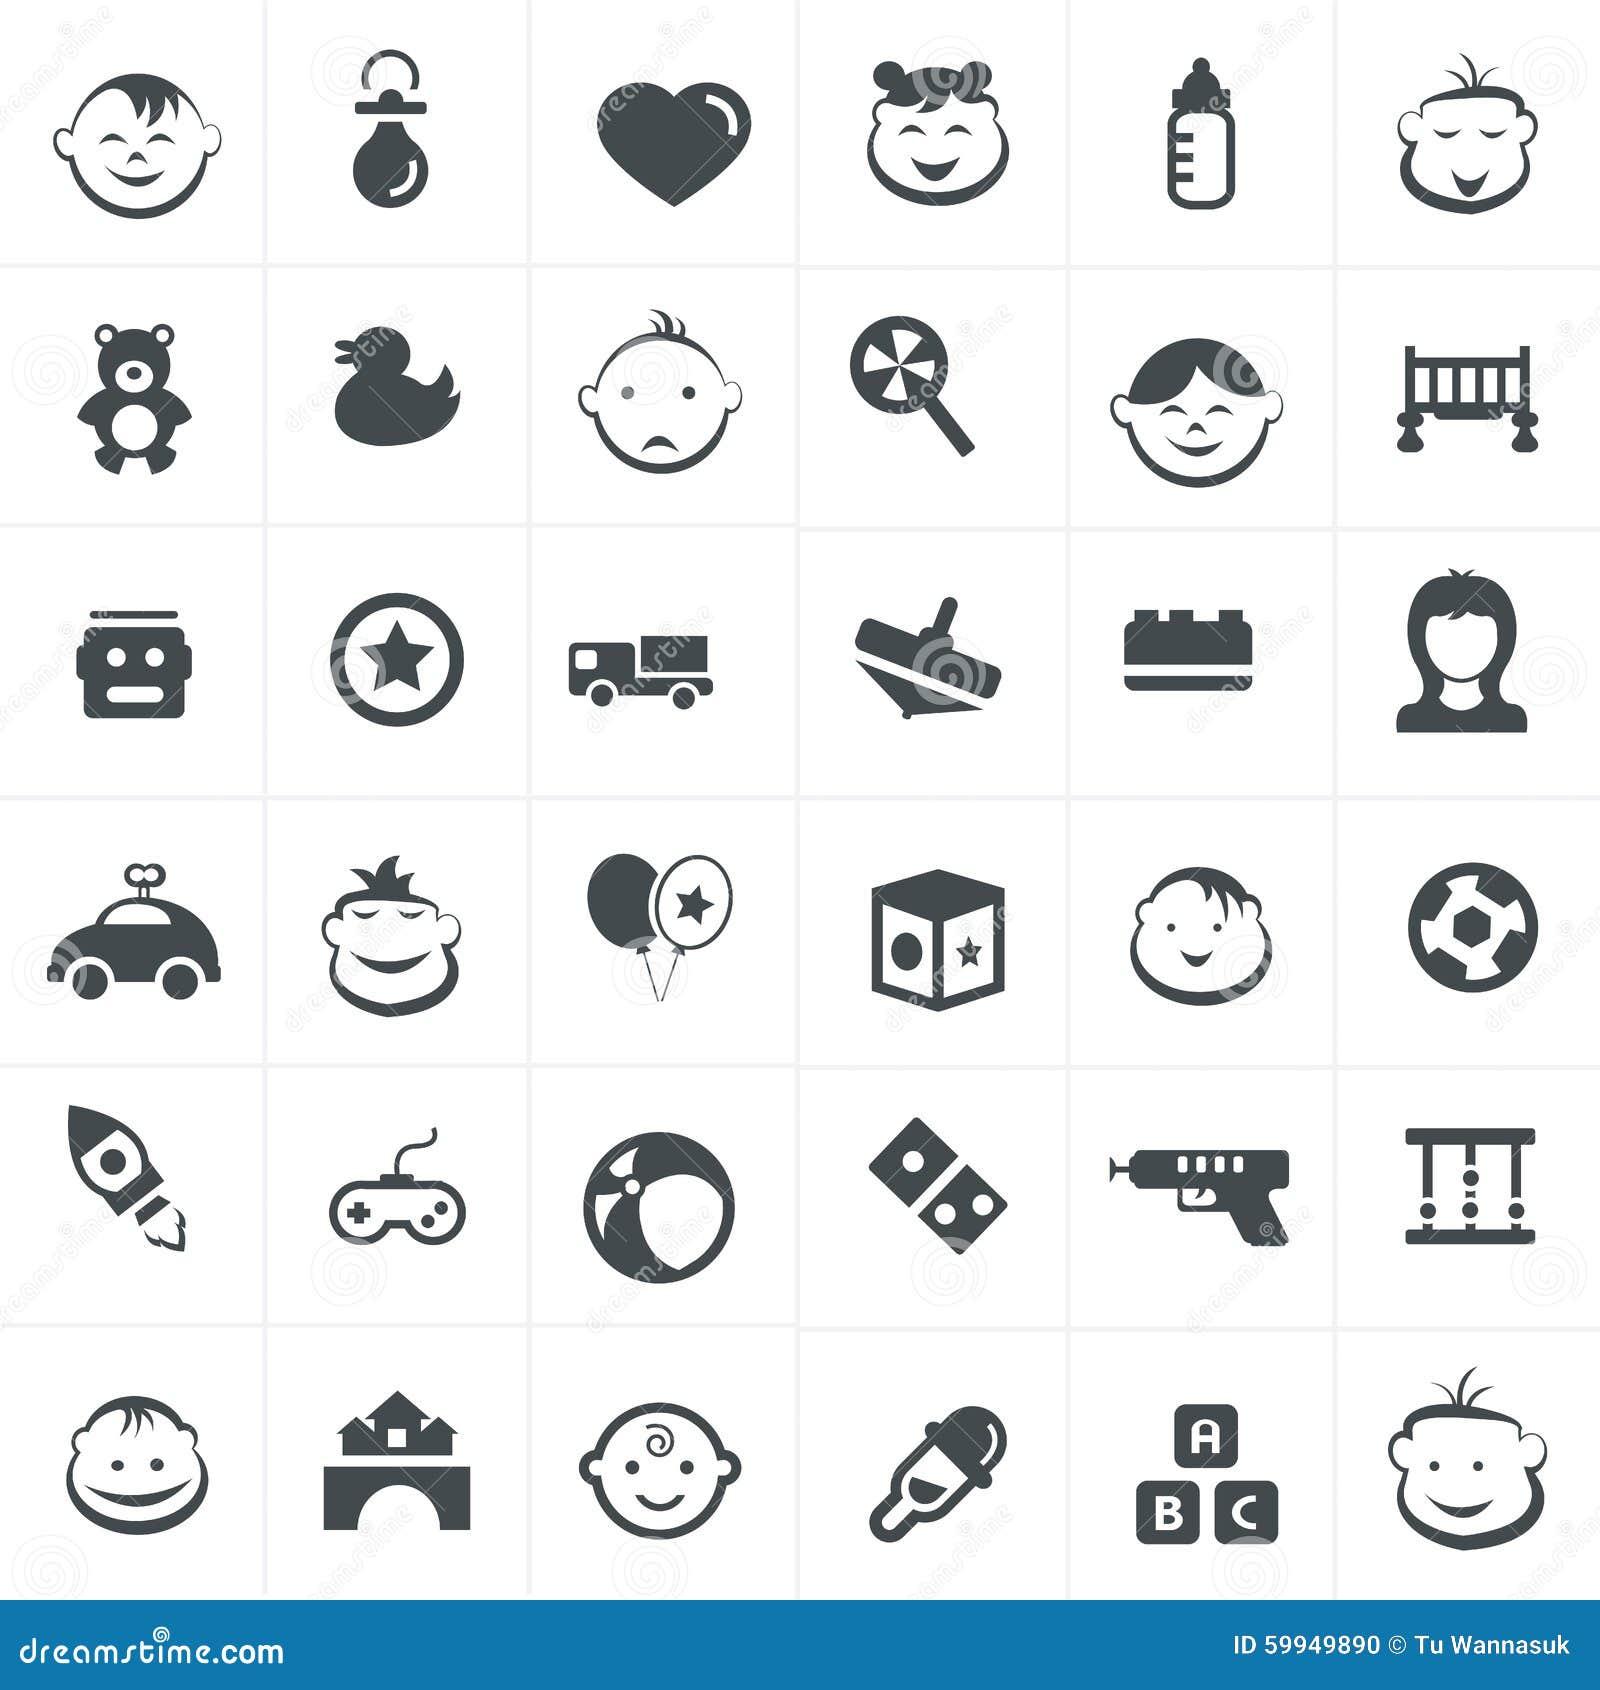 children and toy icons set stock illustration illustration of